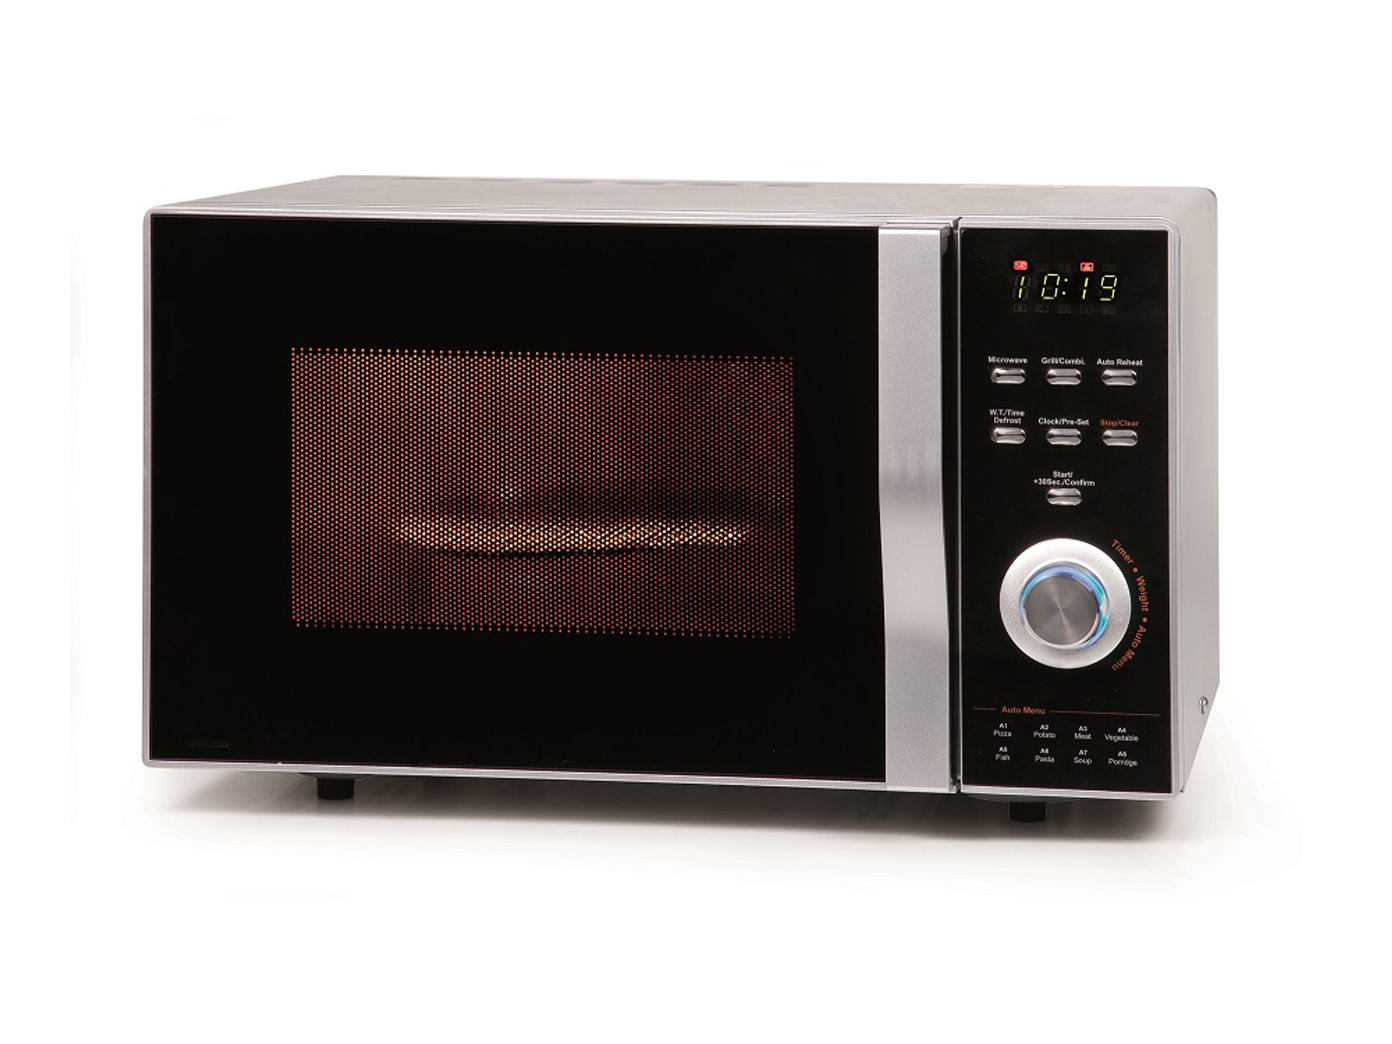 severin mw 7865 mikrowelle mit grill hei luft 800 watt microwelle 20 l ebay. Black Bedroom Furniture Sets. Home Design Ideas